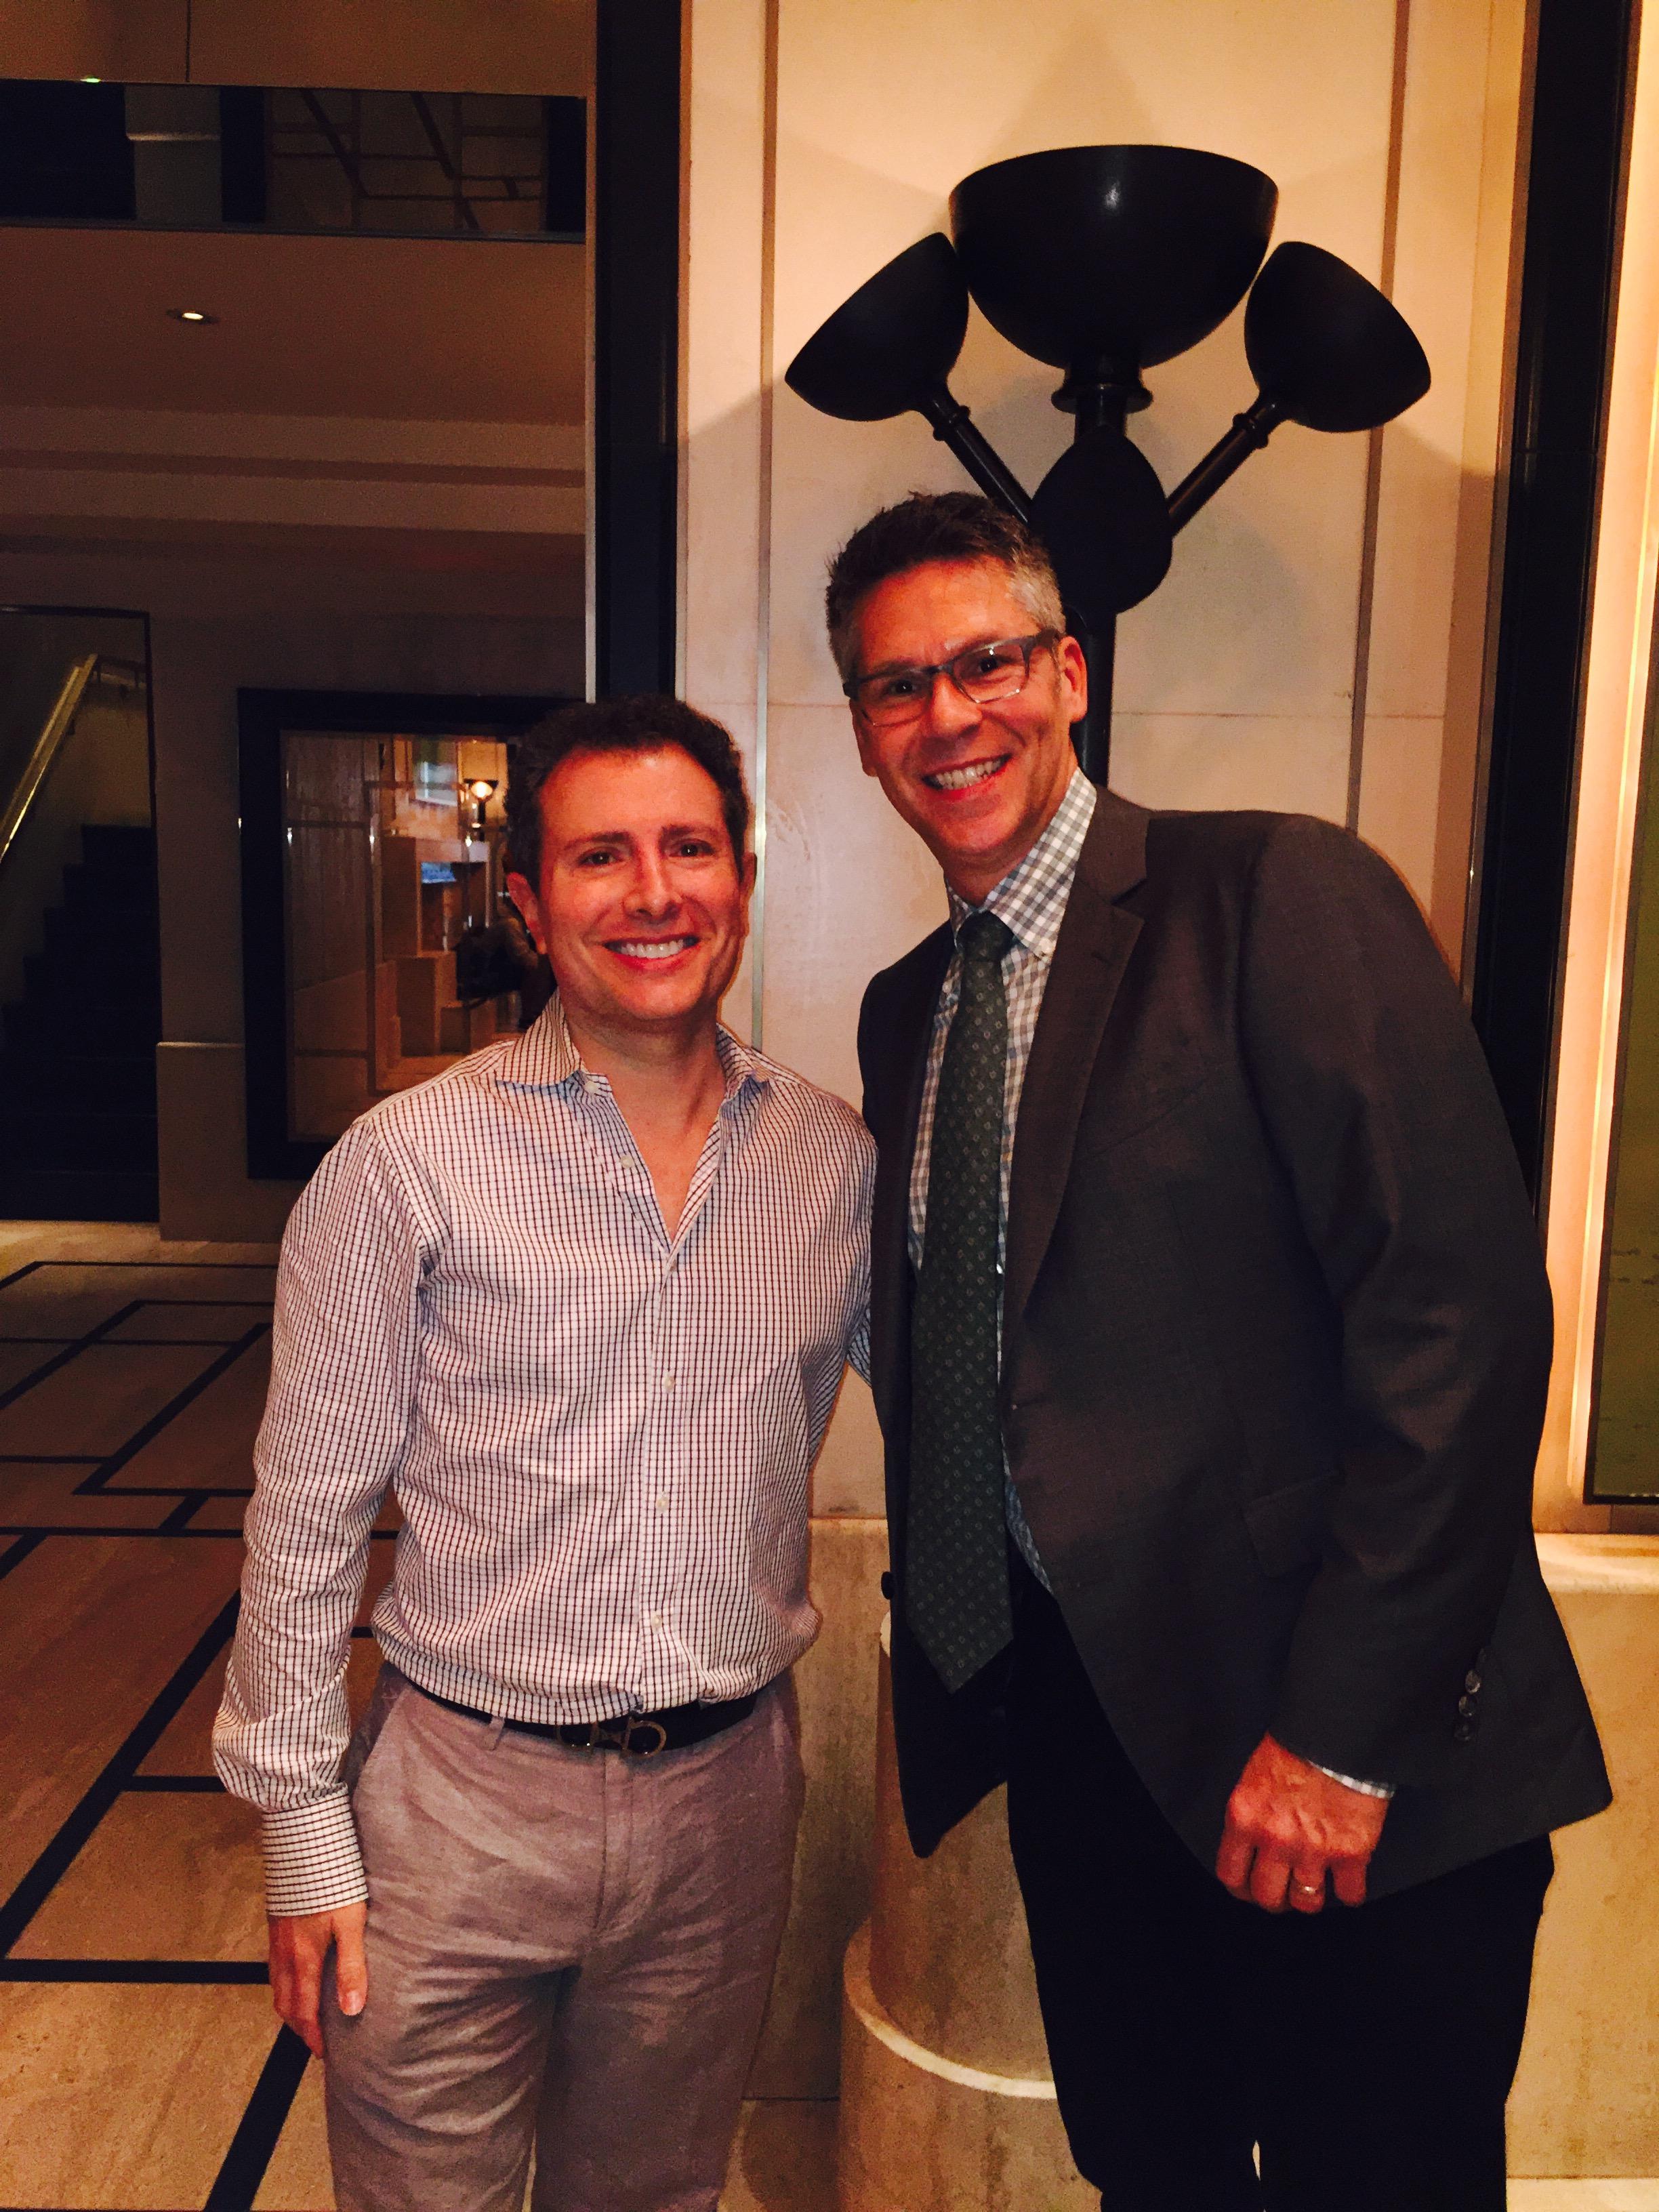 With John Henson